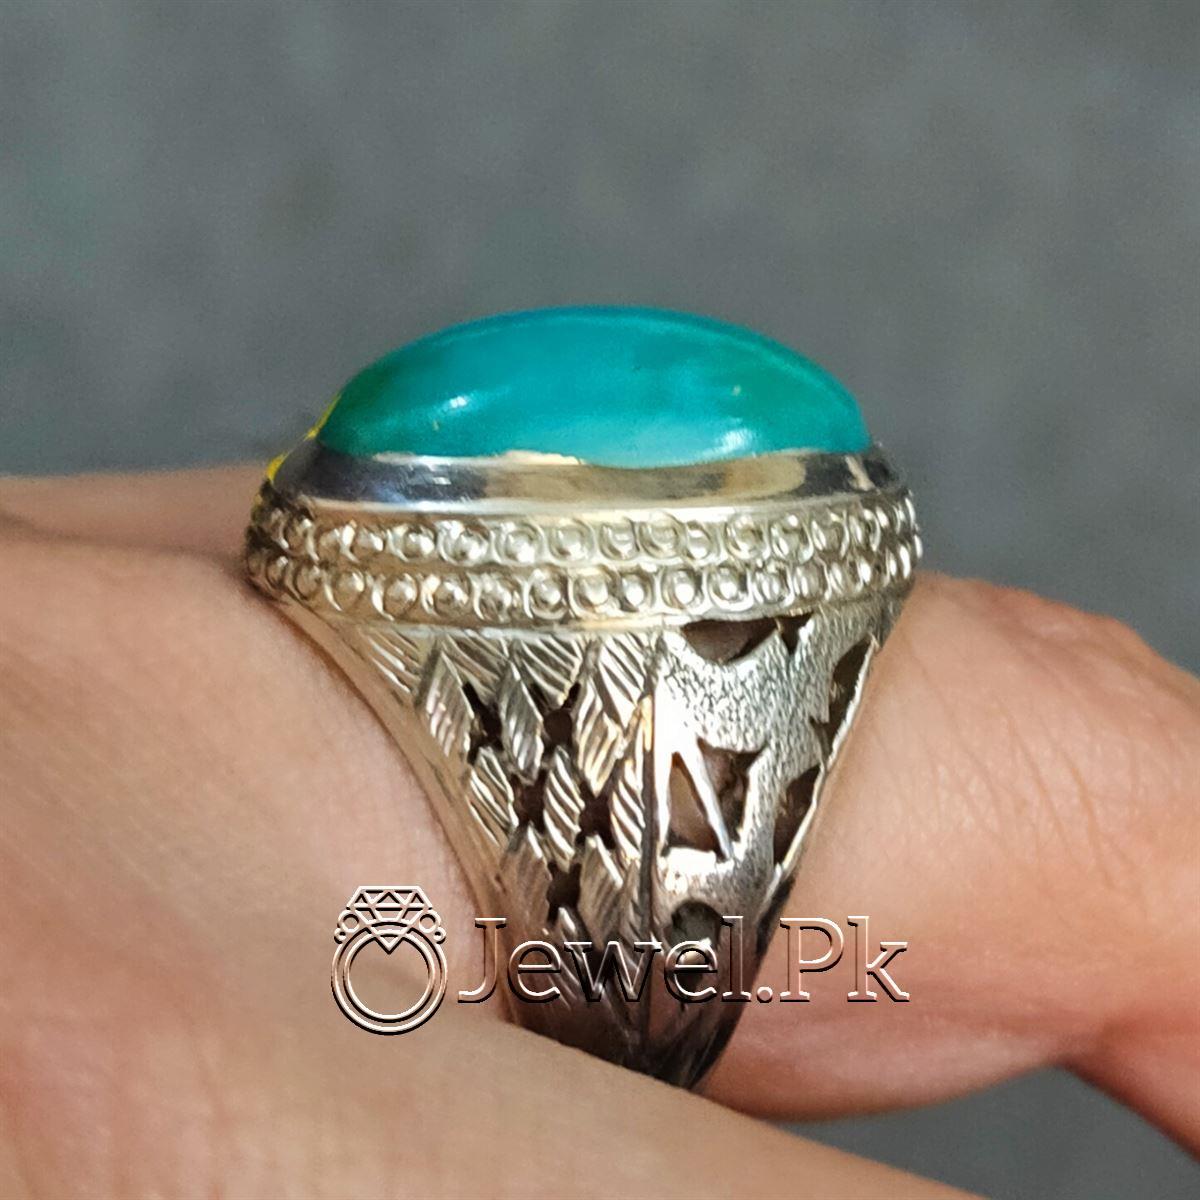 Natural Hussaini Feroza Green Turquoise Nishapuri Feroza 6 natural gemstones pakistan + 925 silver jewelry online